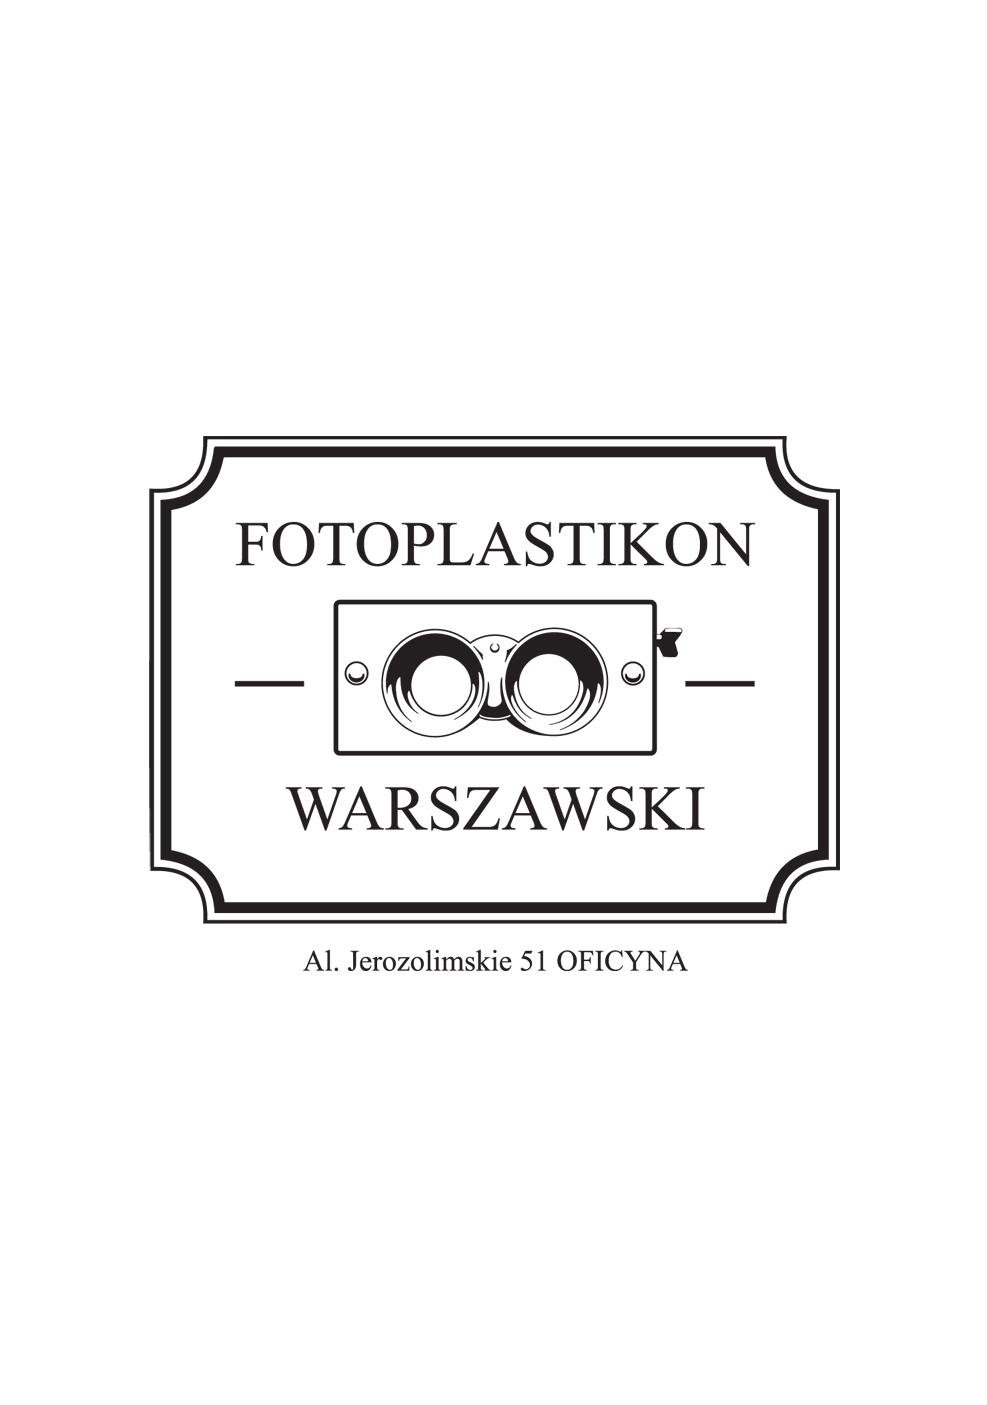 plakat_logo fotoplastikonu